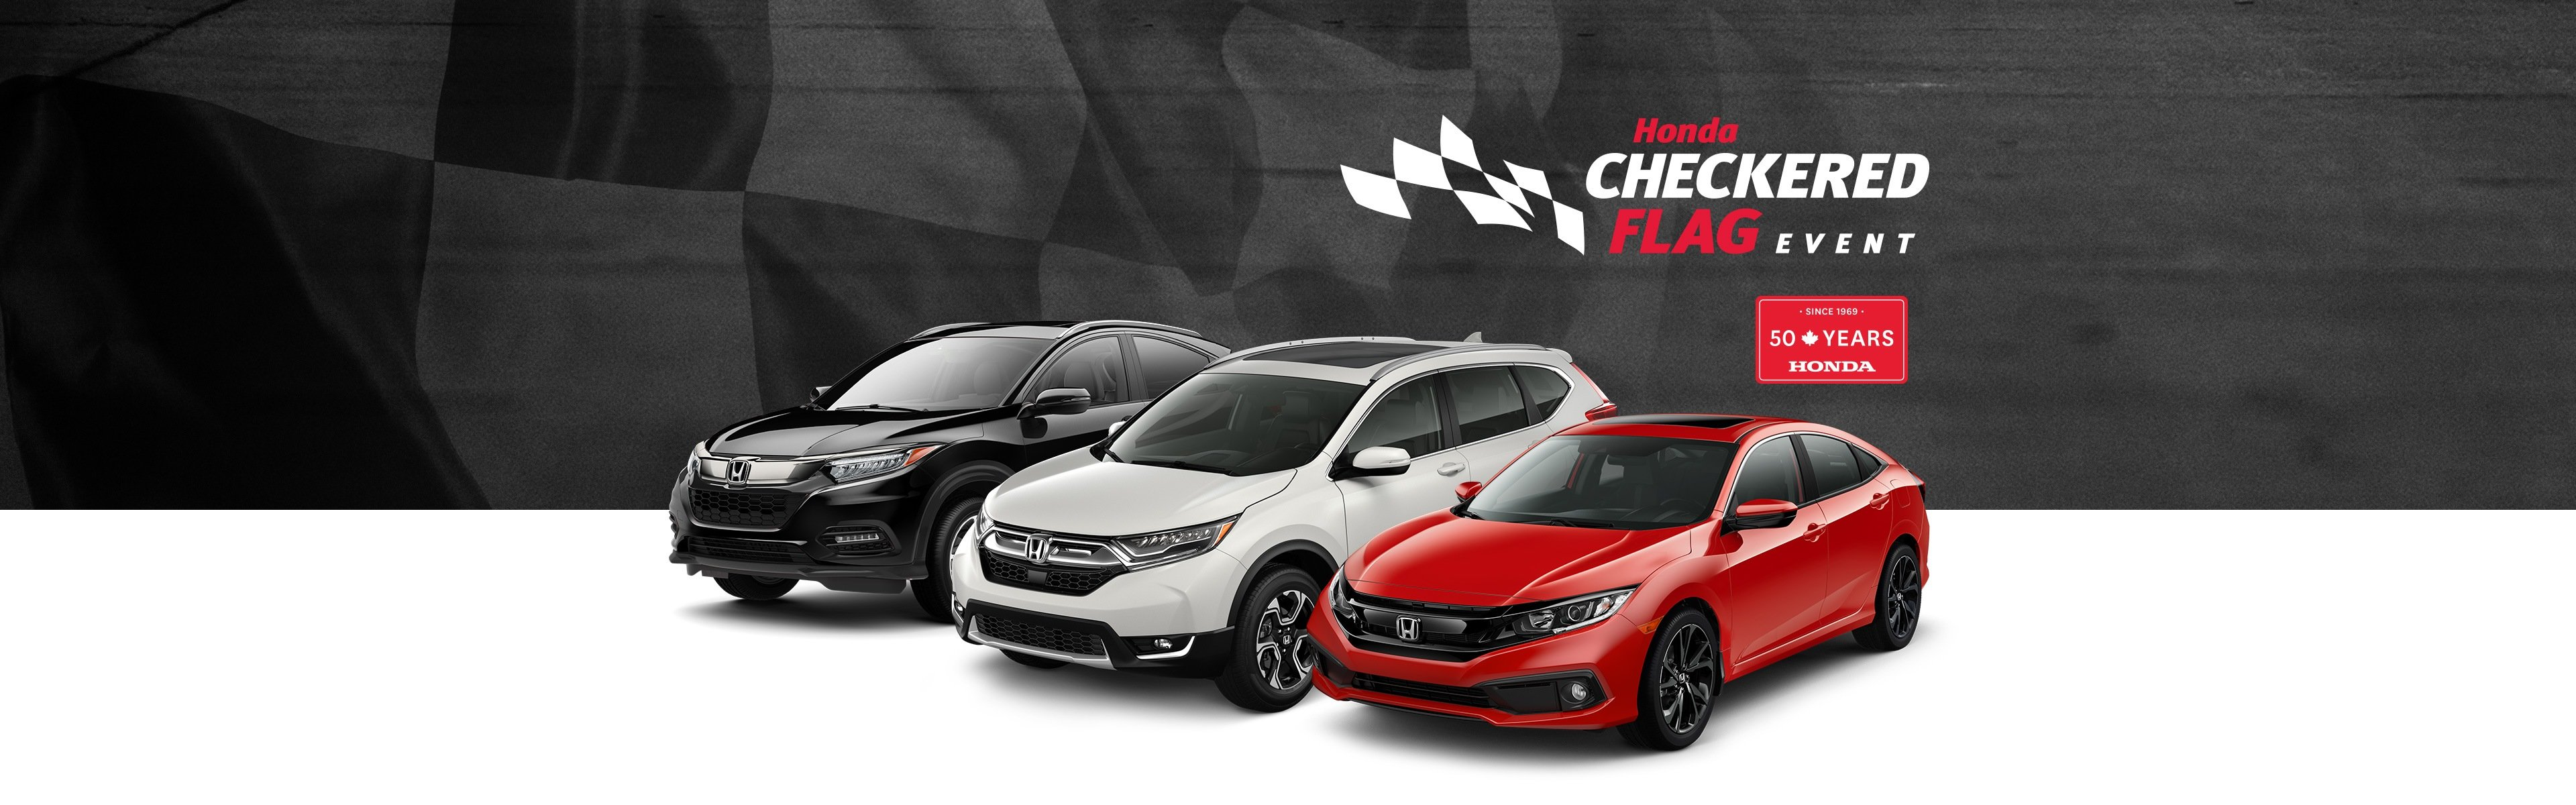 Honda London Ontario >> New Honda Dealership In Swift Current Sk S9h 3v2 Regier Honda